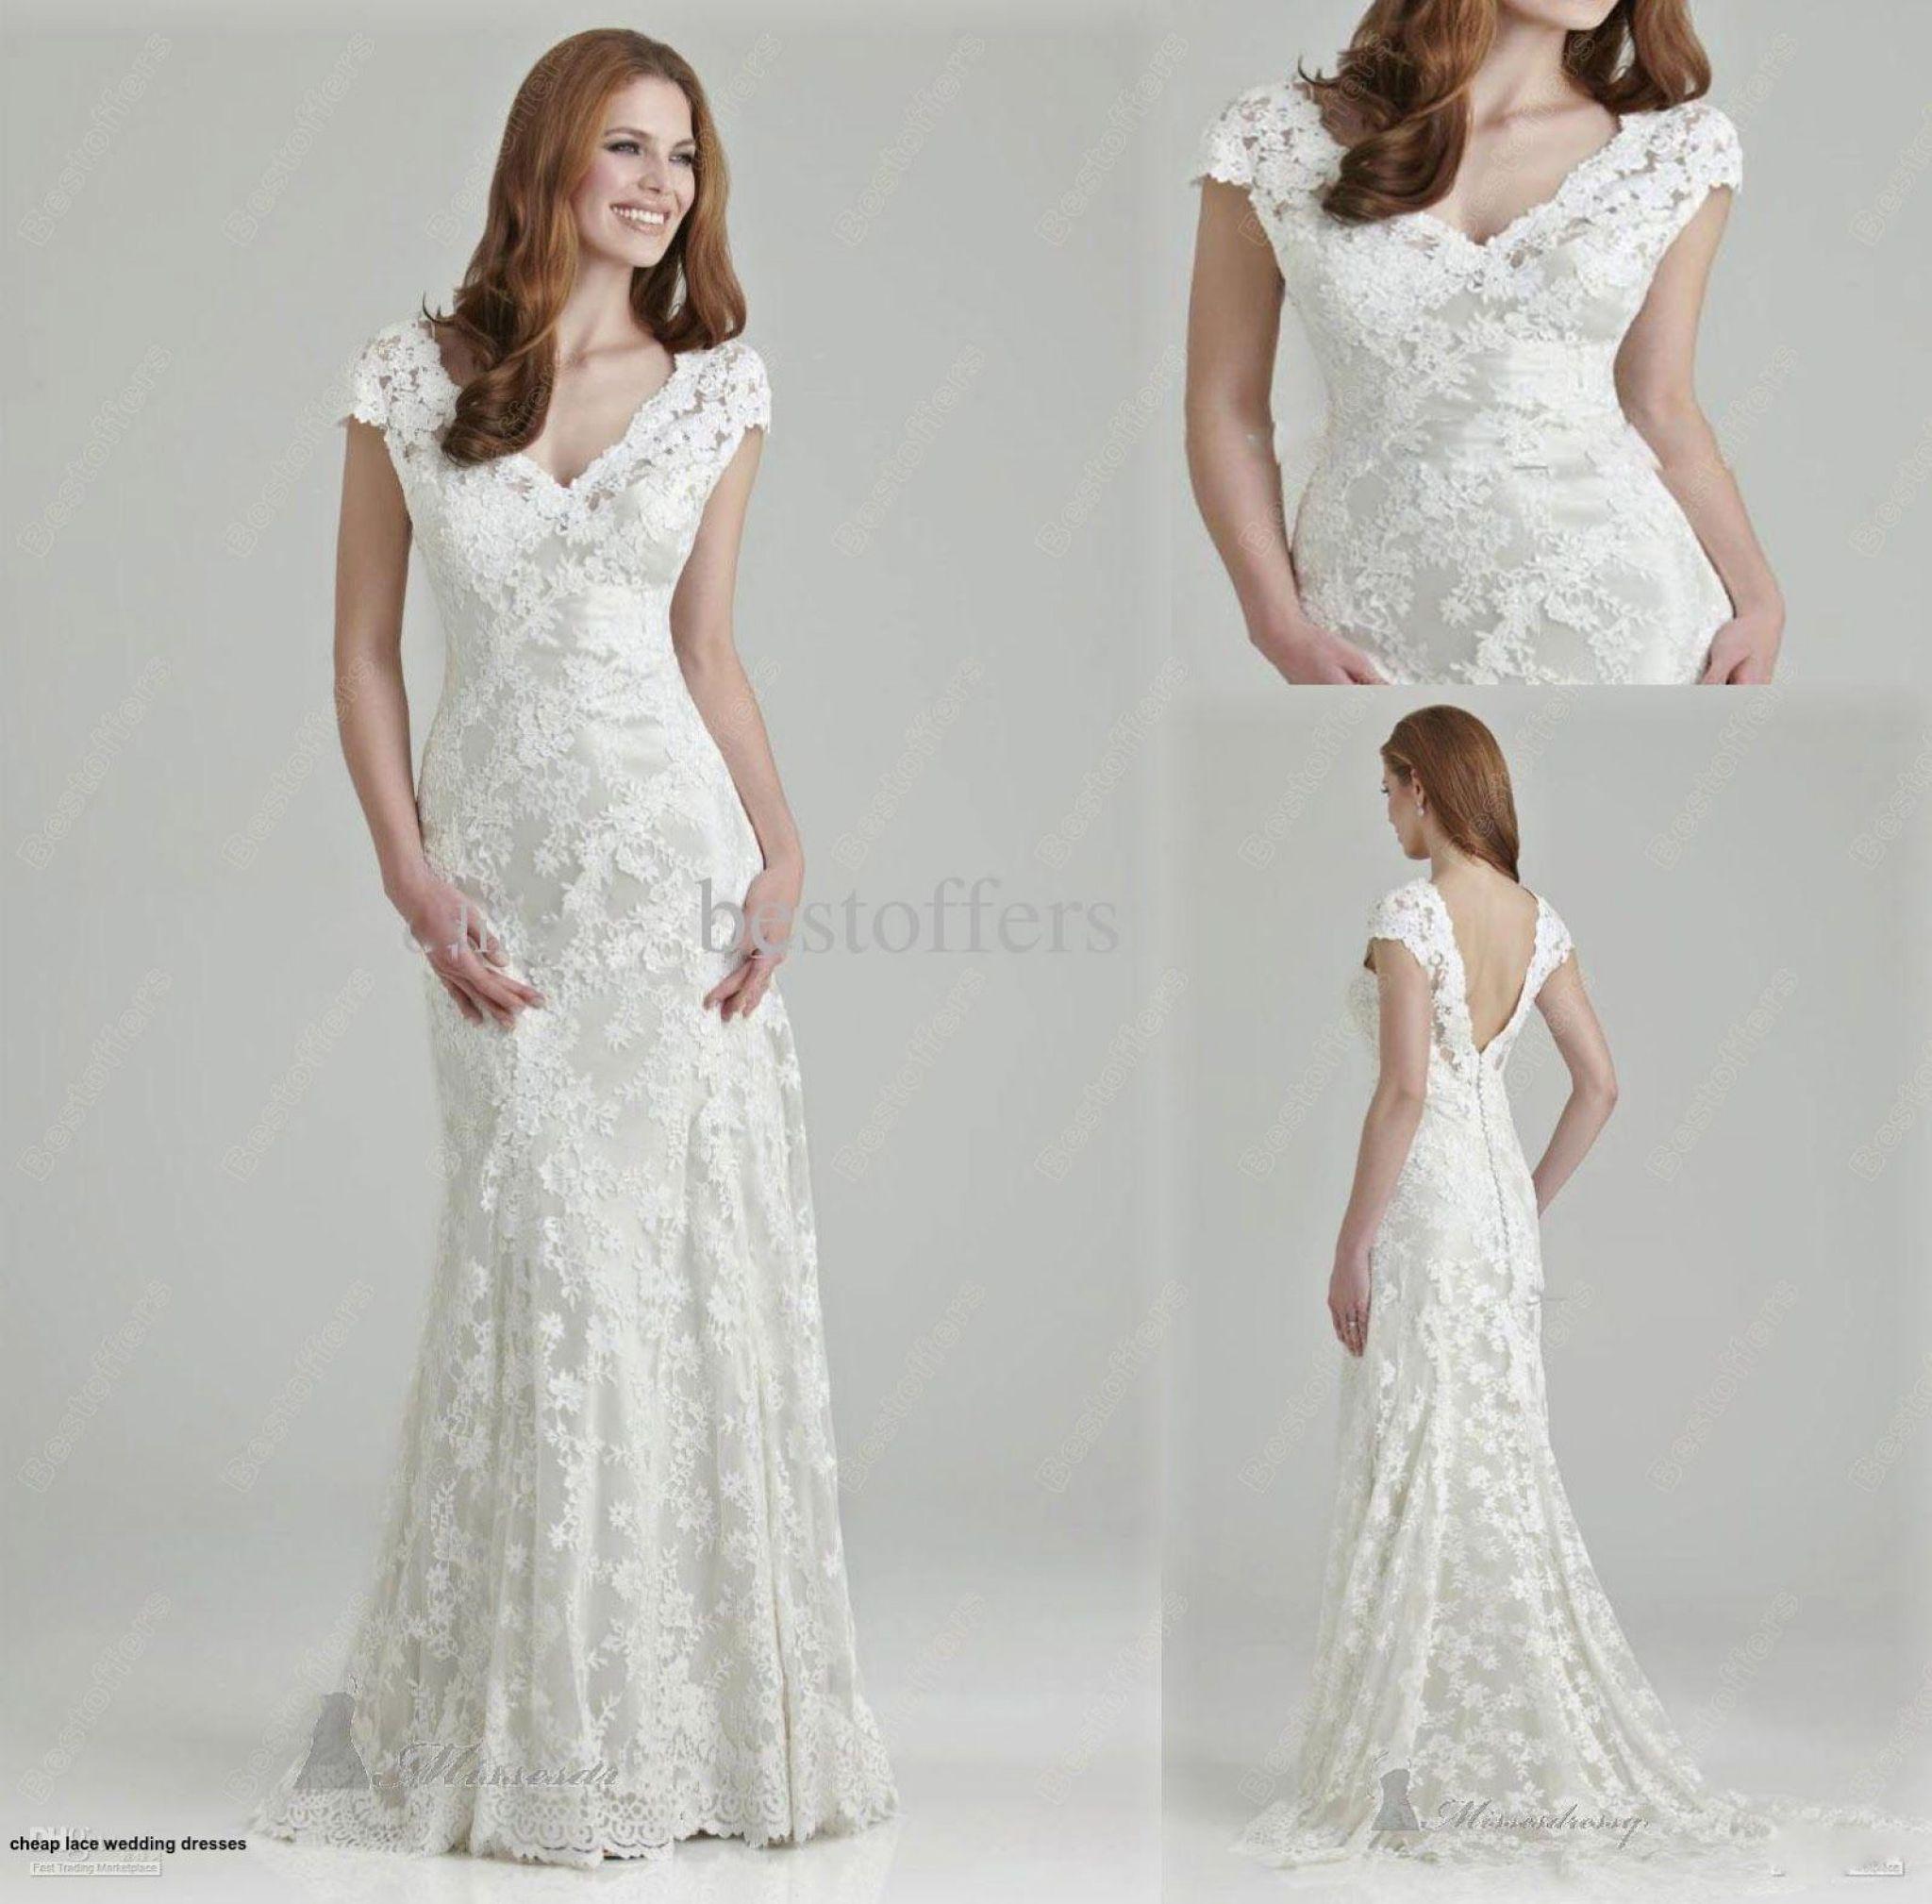 Country dresses for weddings  wedding dresses for  or less  dress for country wedding guest